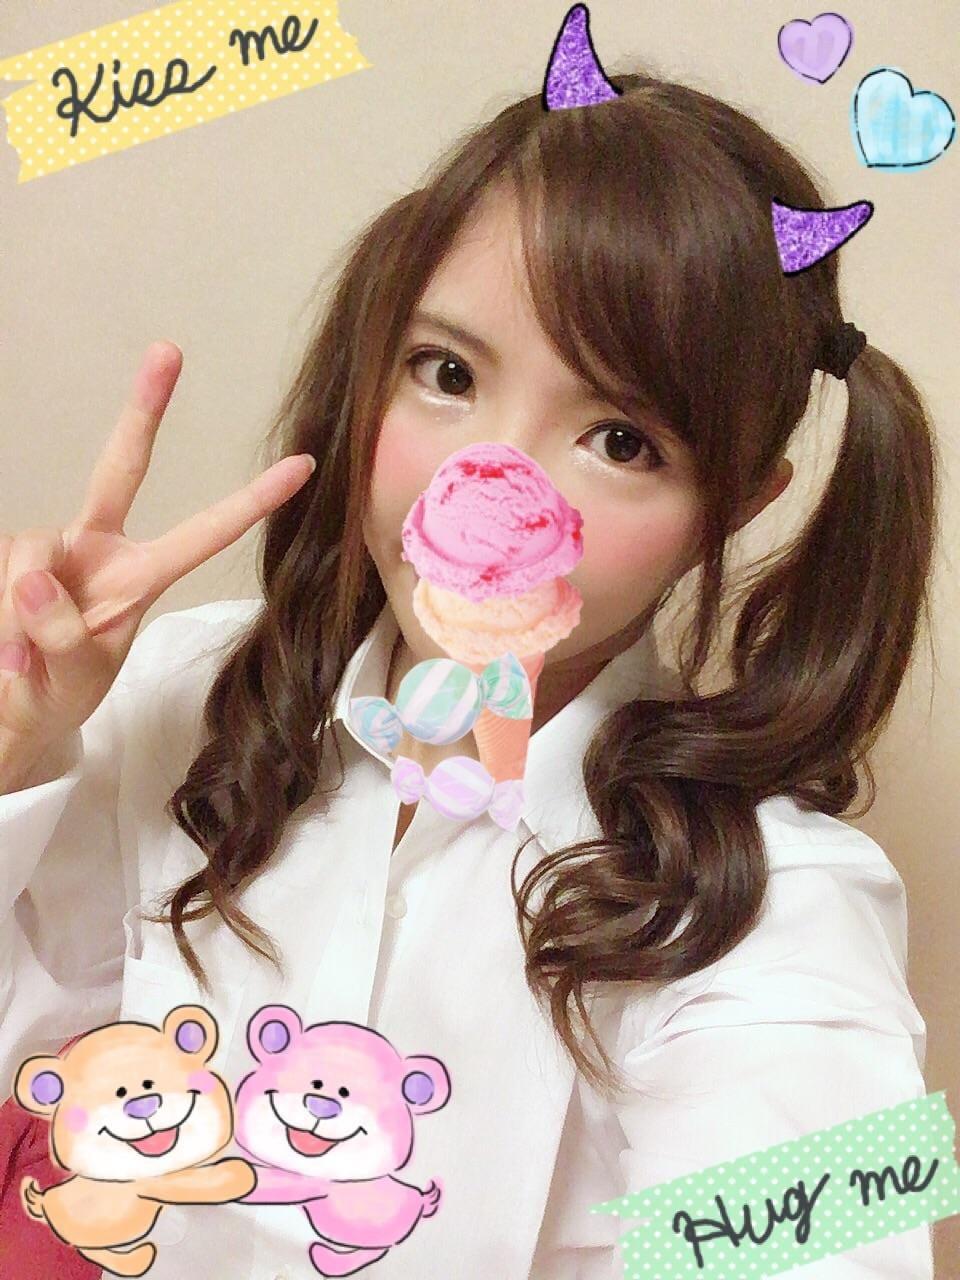 「Yシャツday♡」07/24(火) 13:59   みなみの写メ・風俗動画